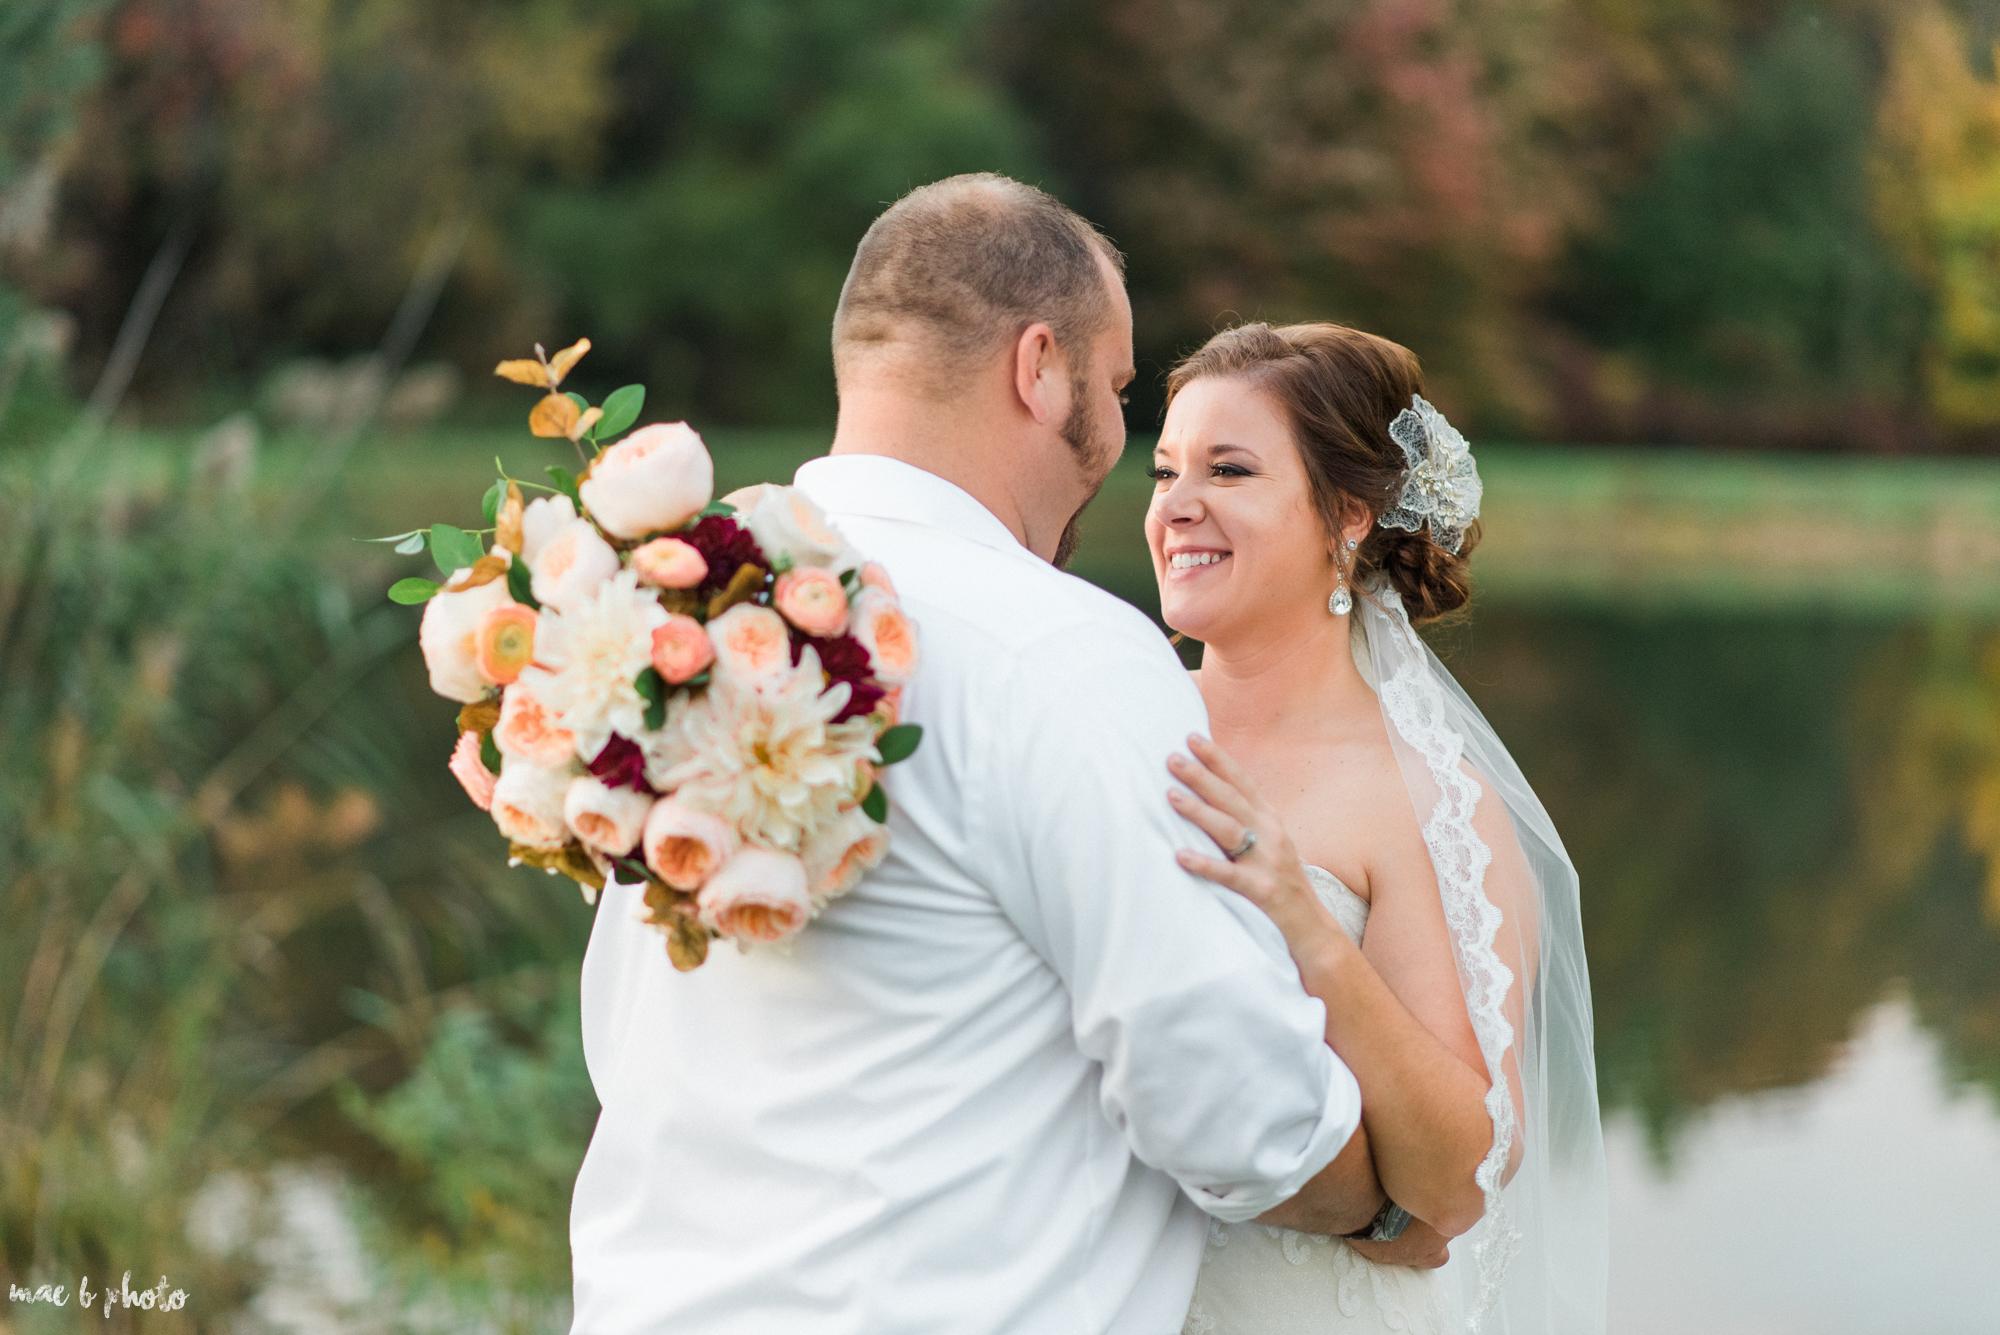 Sarah & Dustin's Rustic Chic Barn Wedding at Hartford Hill Winery in Hartford, Ohio by Mae B Photo-82.jpg